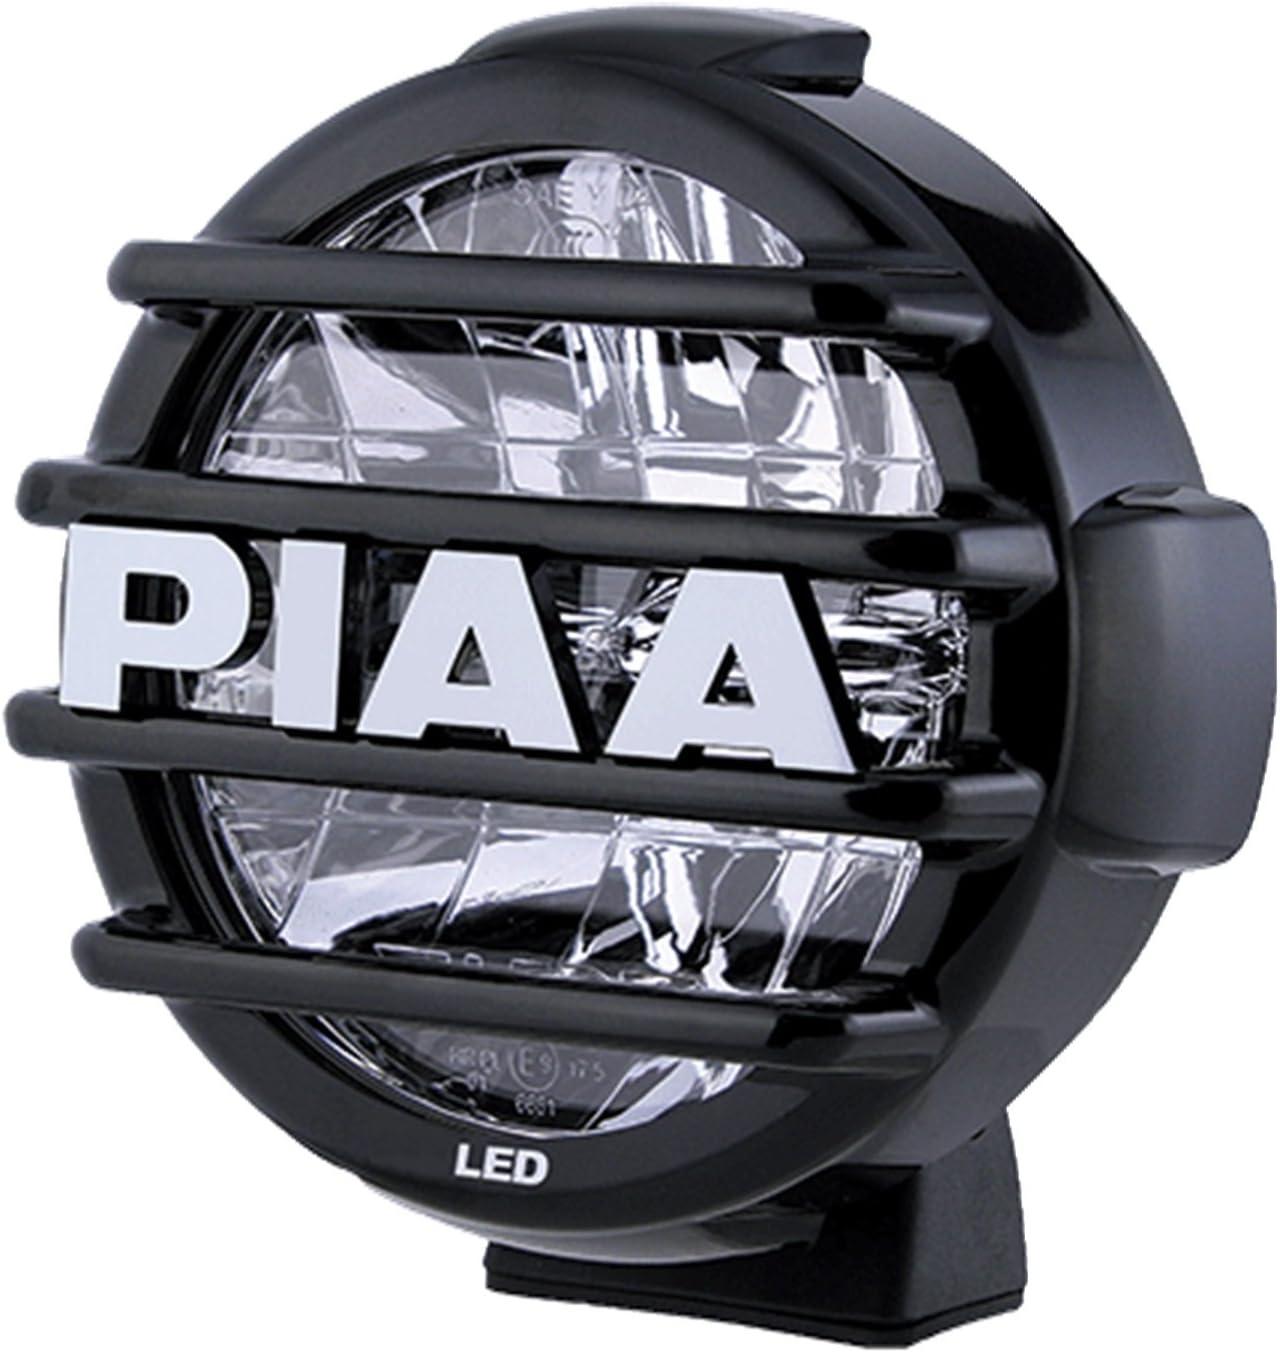 Piaa 5702 570 LED Driving Lamp, white